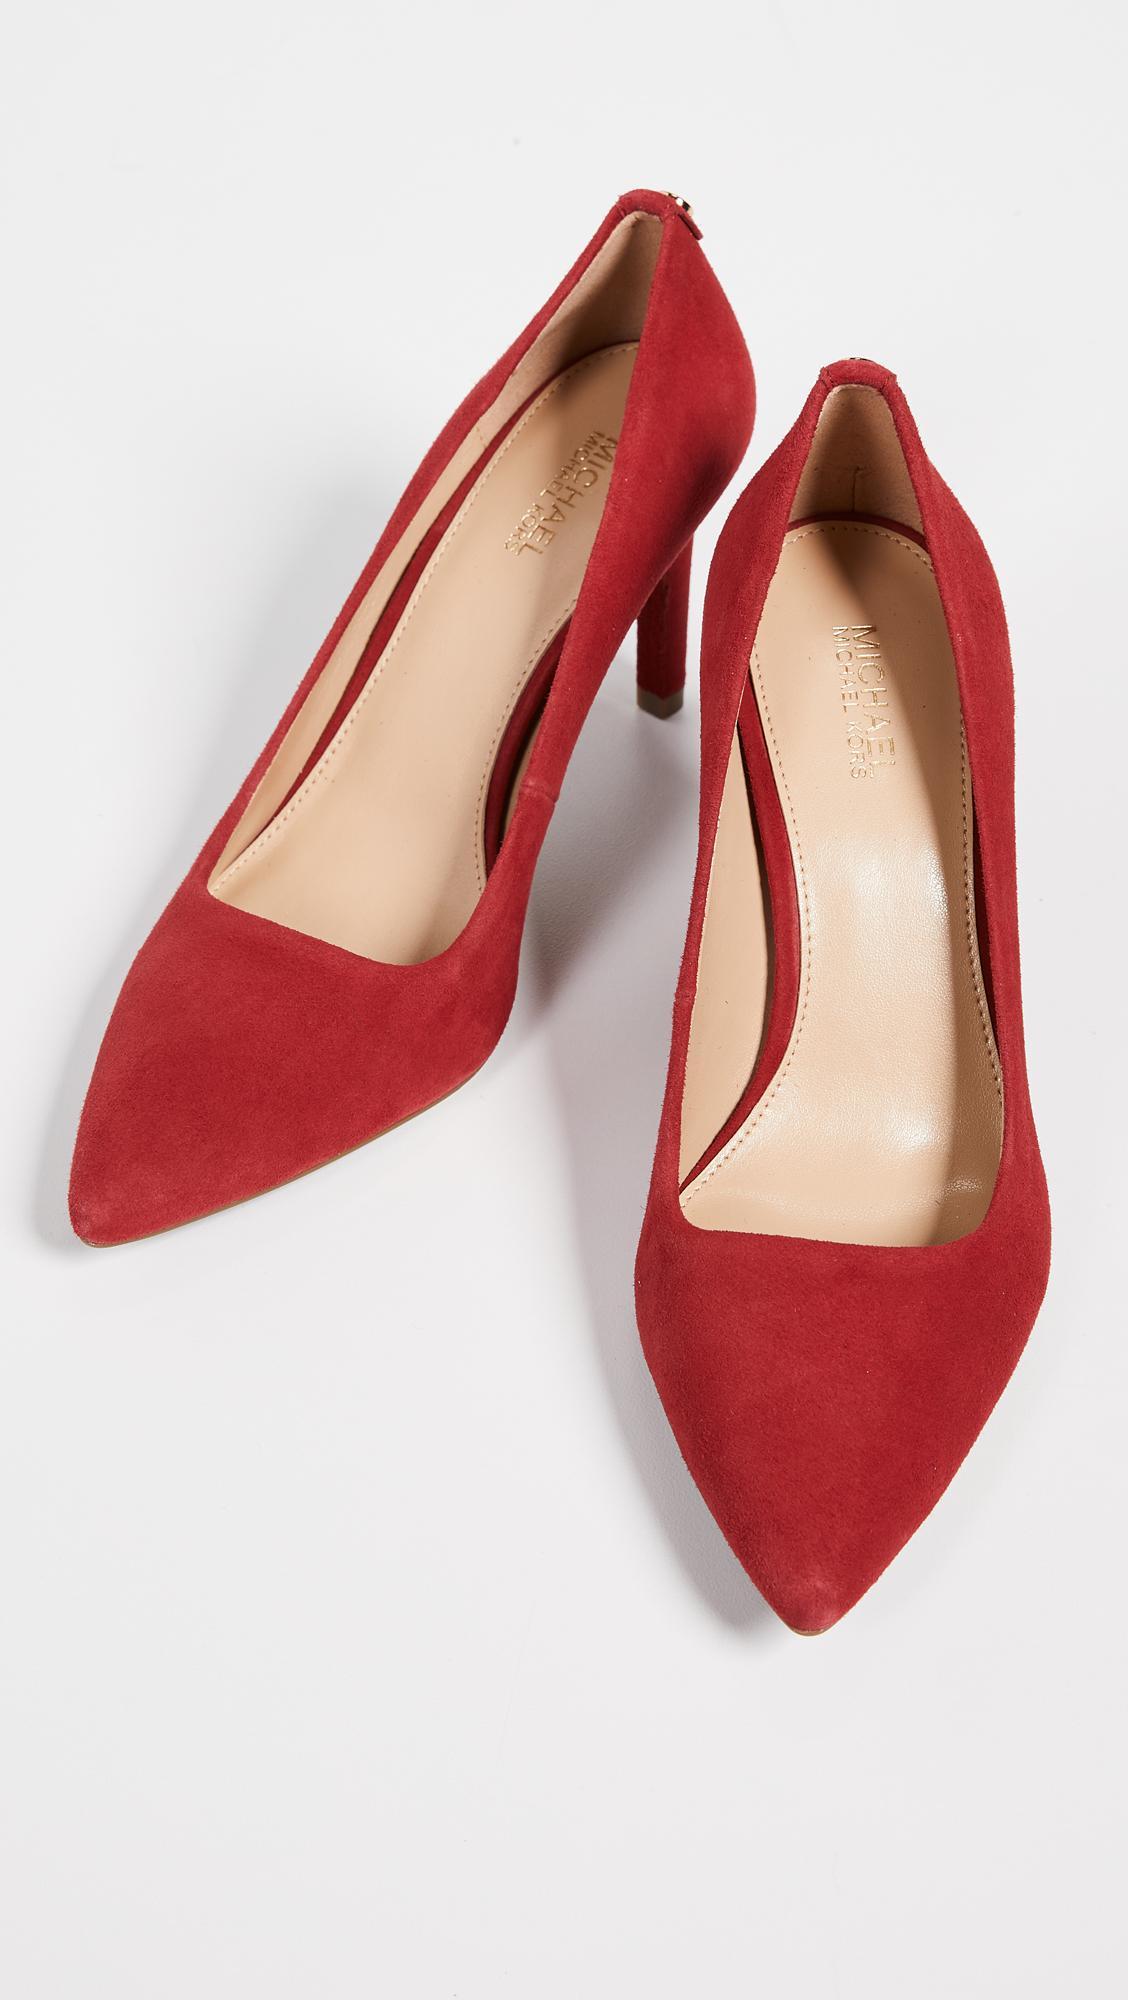 b102f31abf6 Lyst - MICHAEL Michael Kors Dorothy Flex Pumps in Red